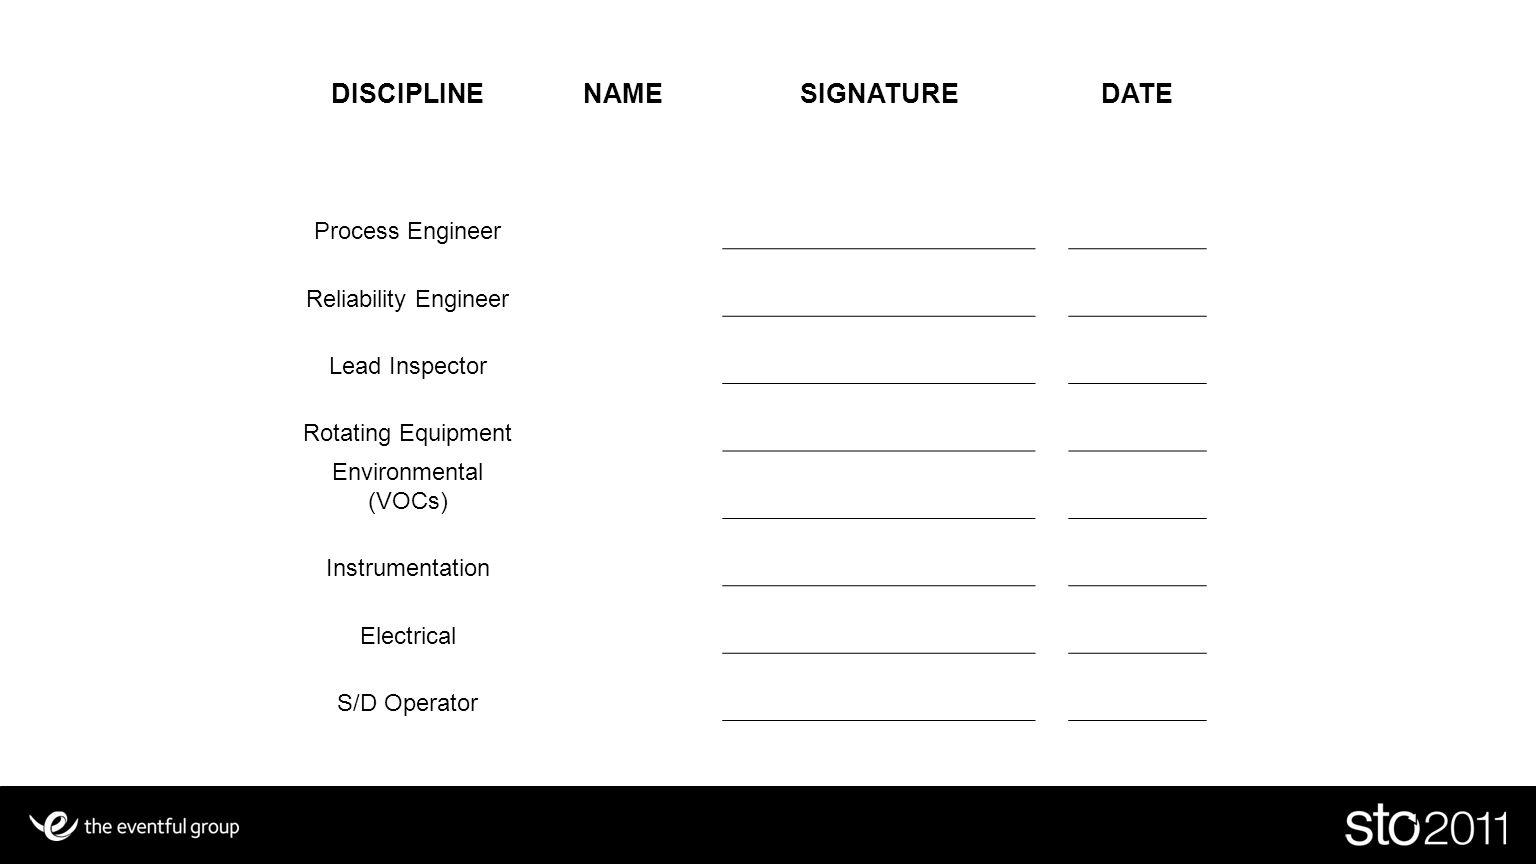 DISCIPLINENAMESIGNATUREDATE Process Engineer Reliability Engineer Lead Inspector Rotating Equipment Environmental (VOCs) Instrumentation Electrical S/